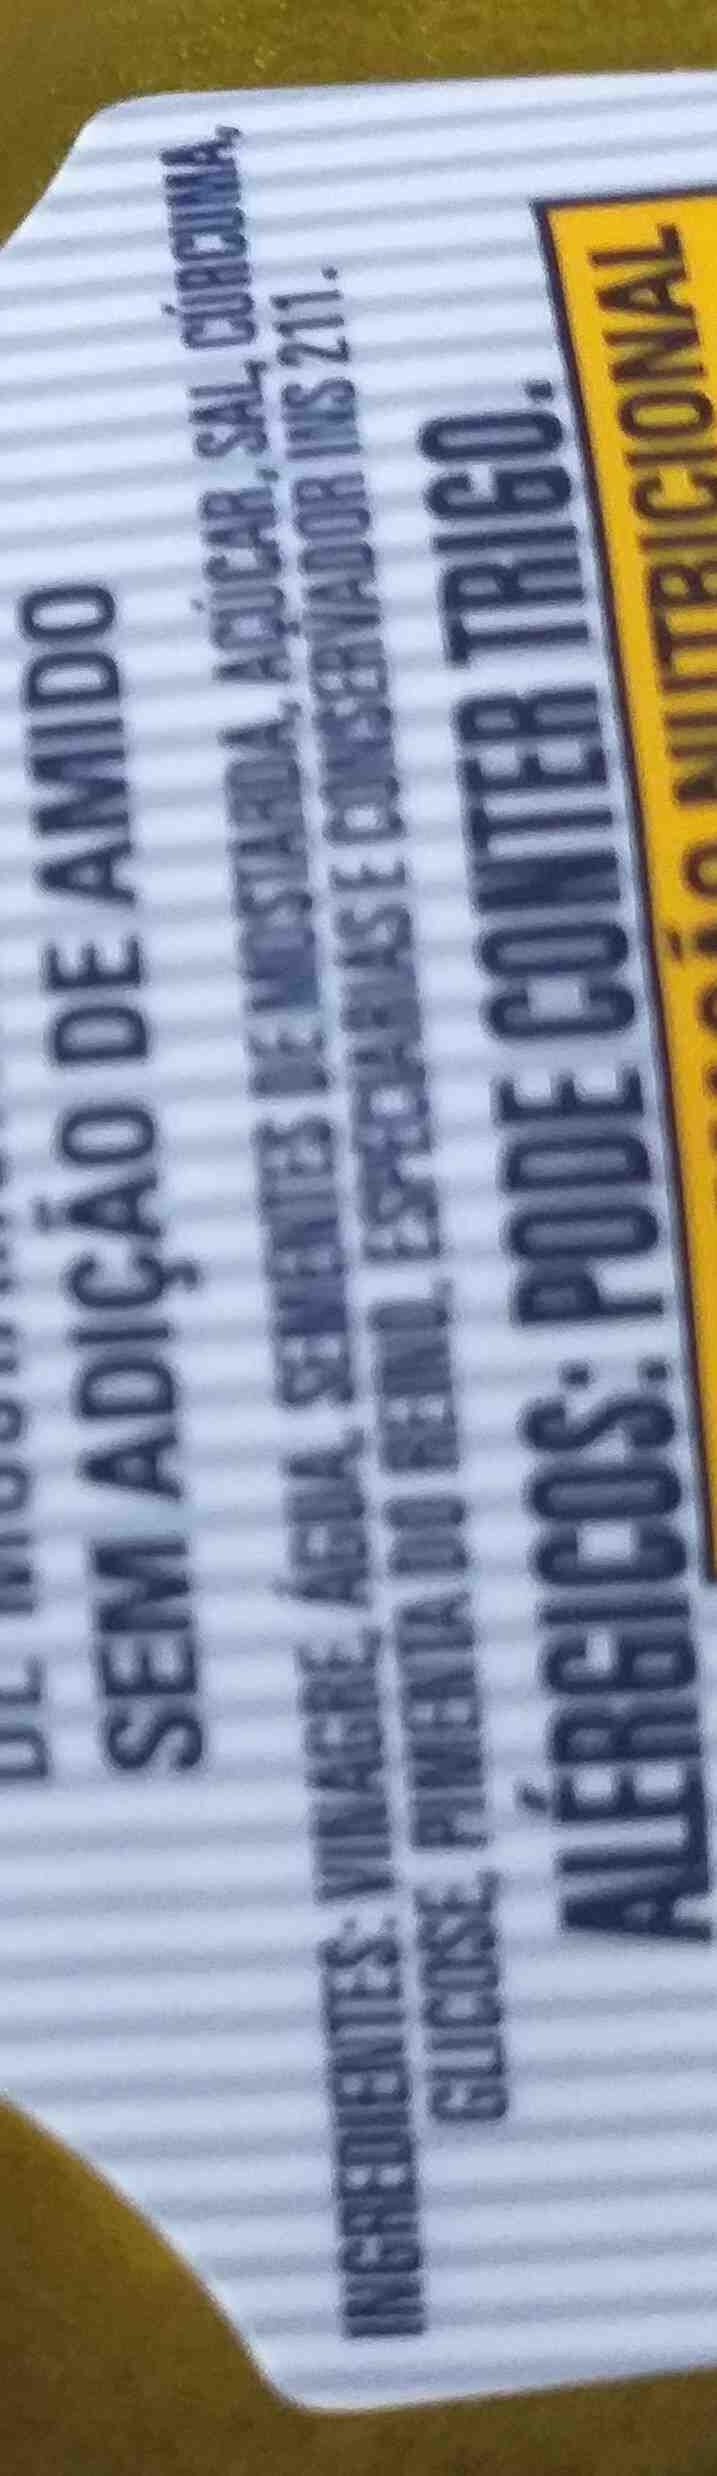 Mostarda Amarela Hemmer - Ingredientes - en